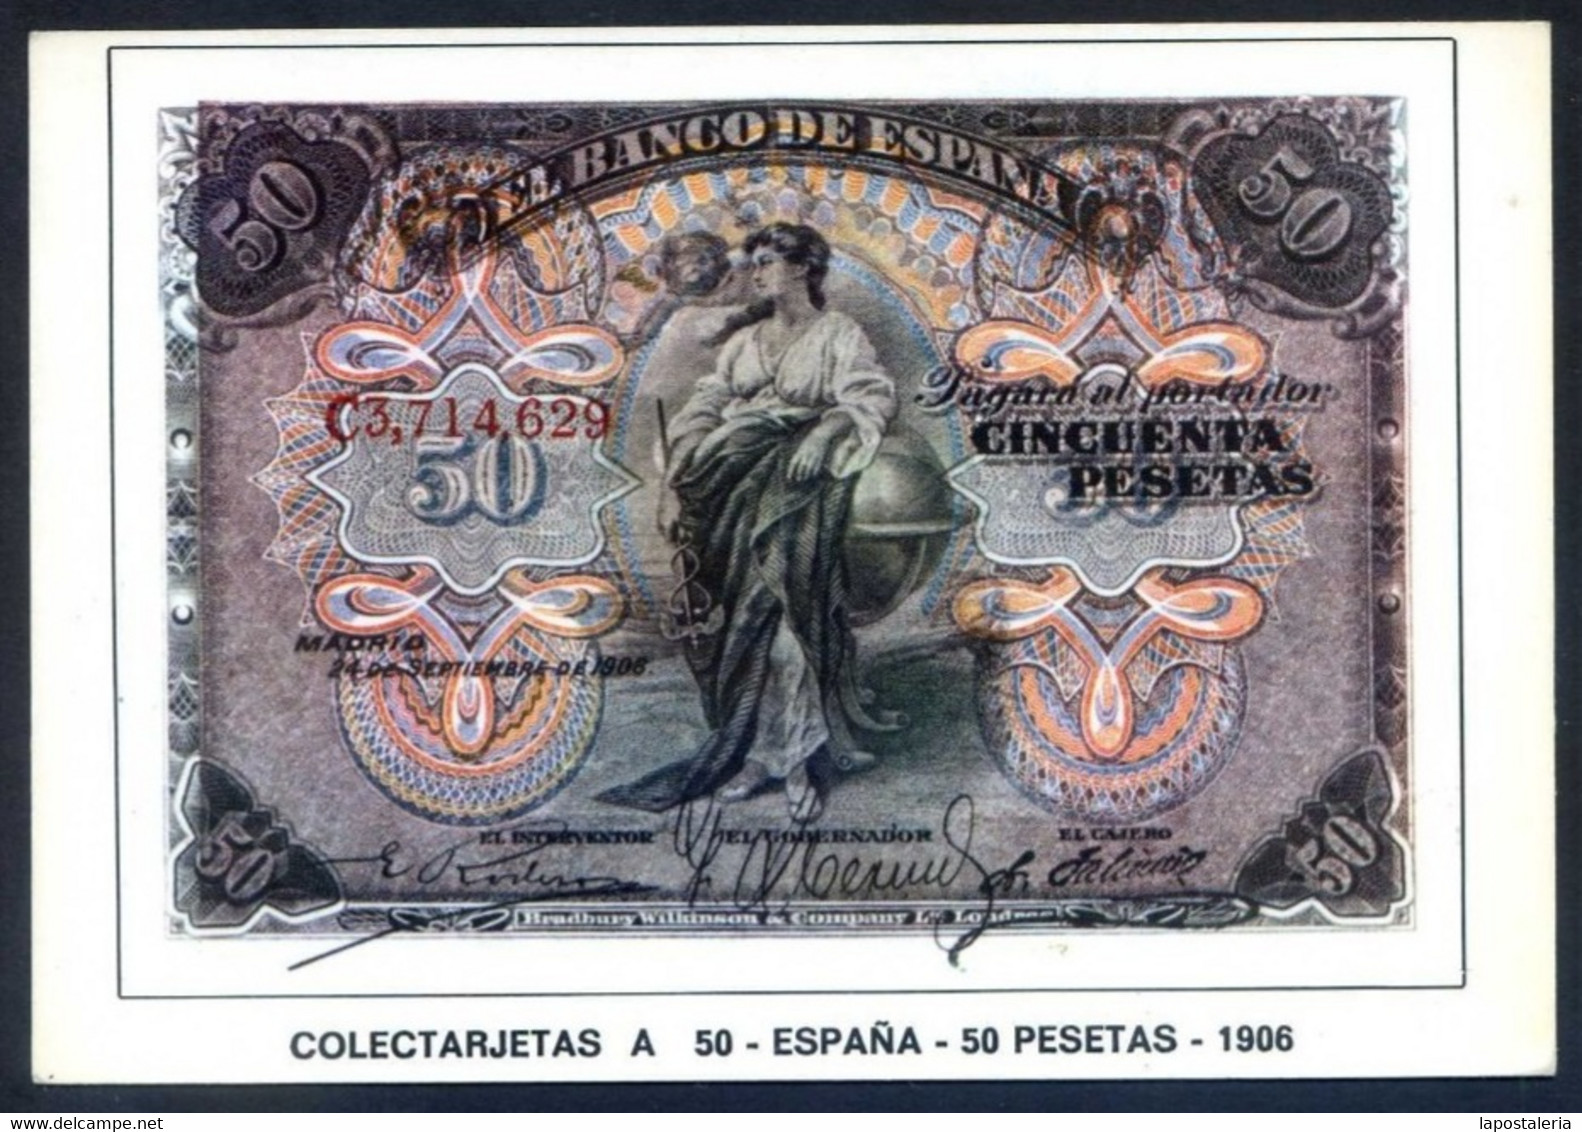 Colectarjetas A 50 - *España - 50 Pesetas - 1906* Ed. Eurohobby. Nueva. - Monedas (representaciones)